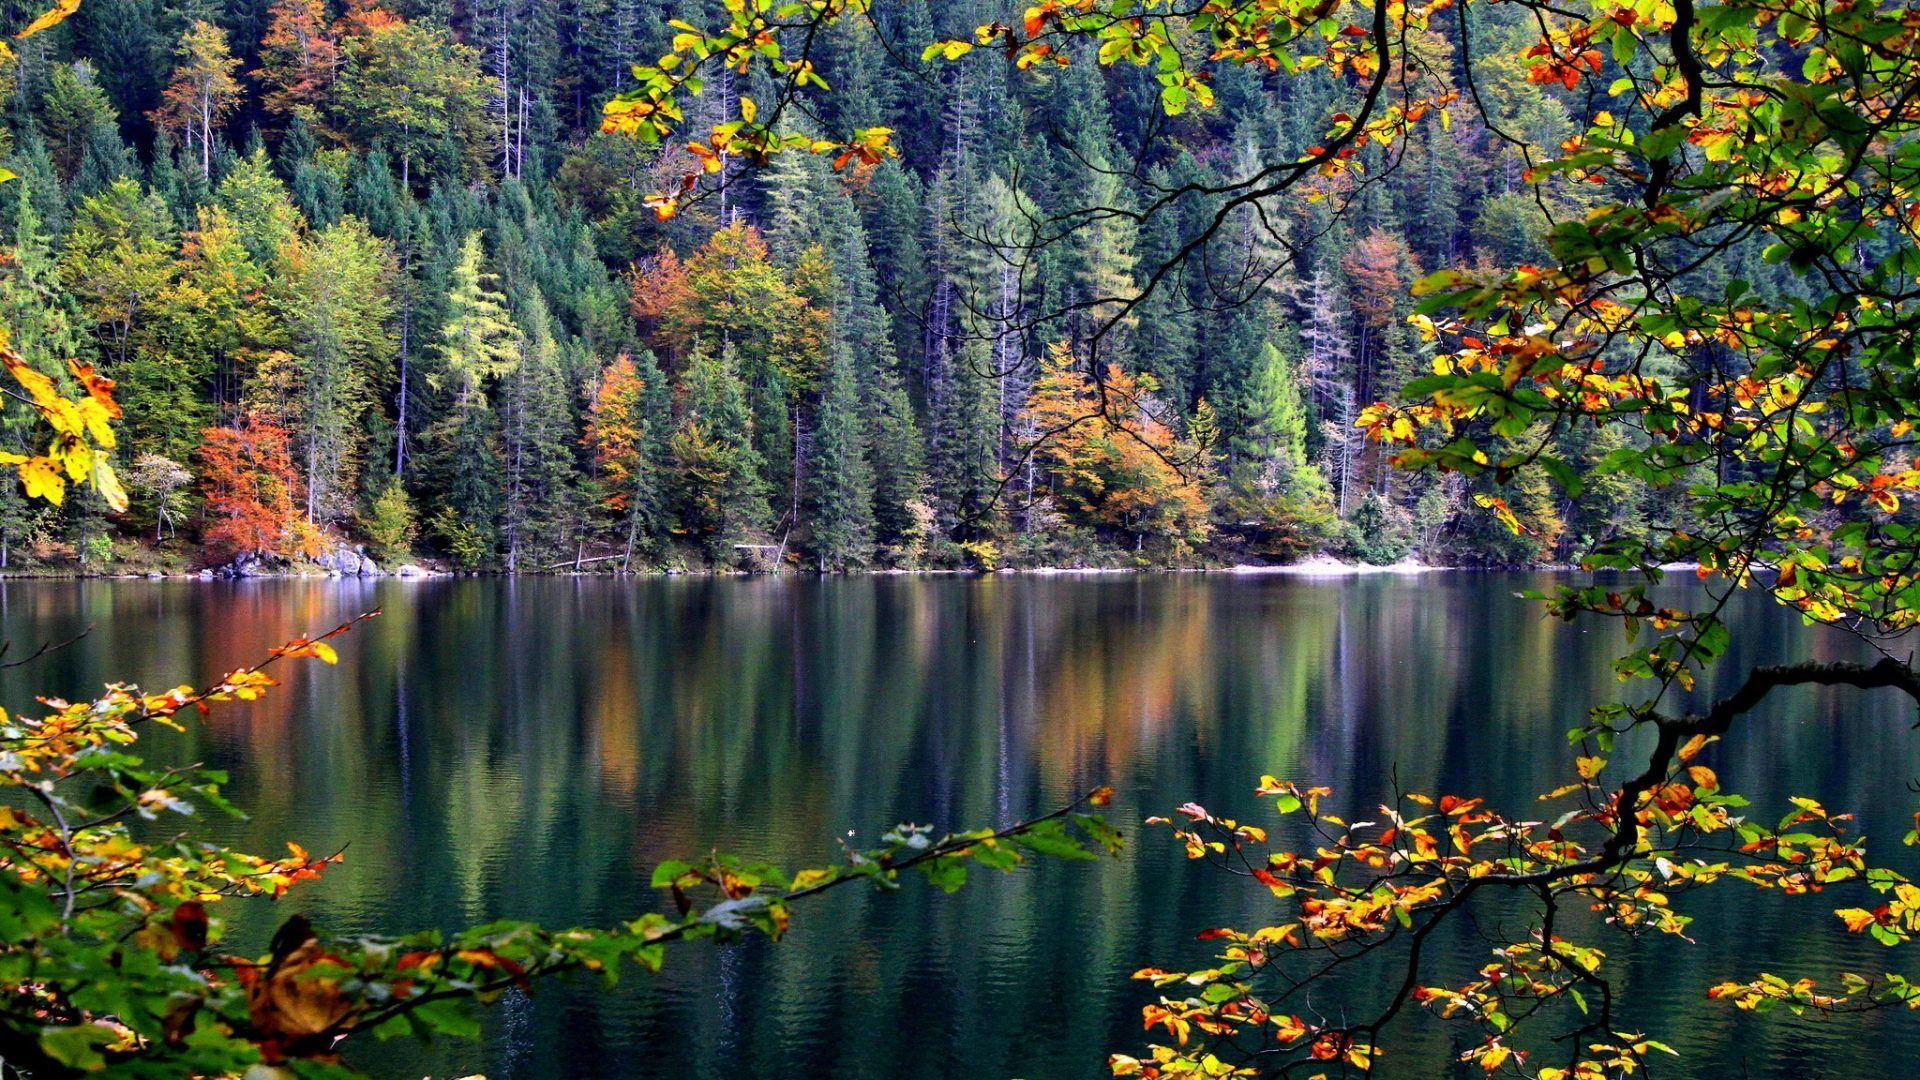 wpnature com color forest autumn lake sklon les derevya reka osen wallpaper desktop backgrounds